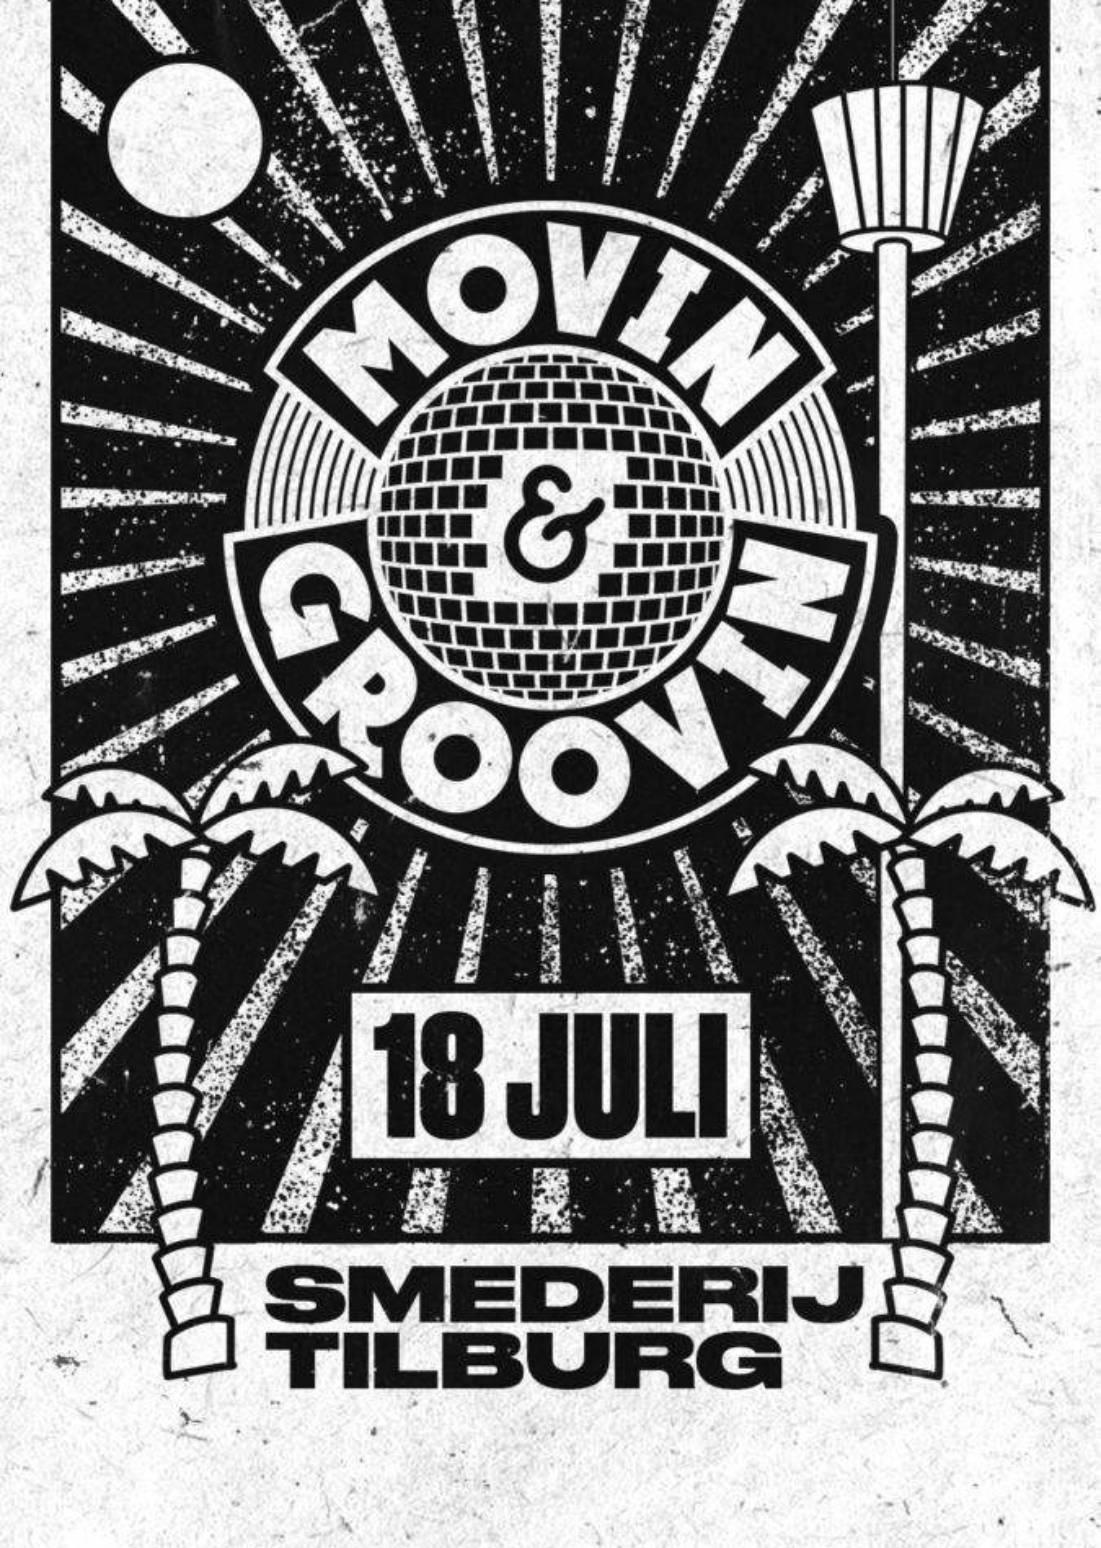 Movin' & Groovin' | Smederijtuin